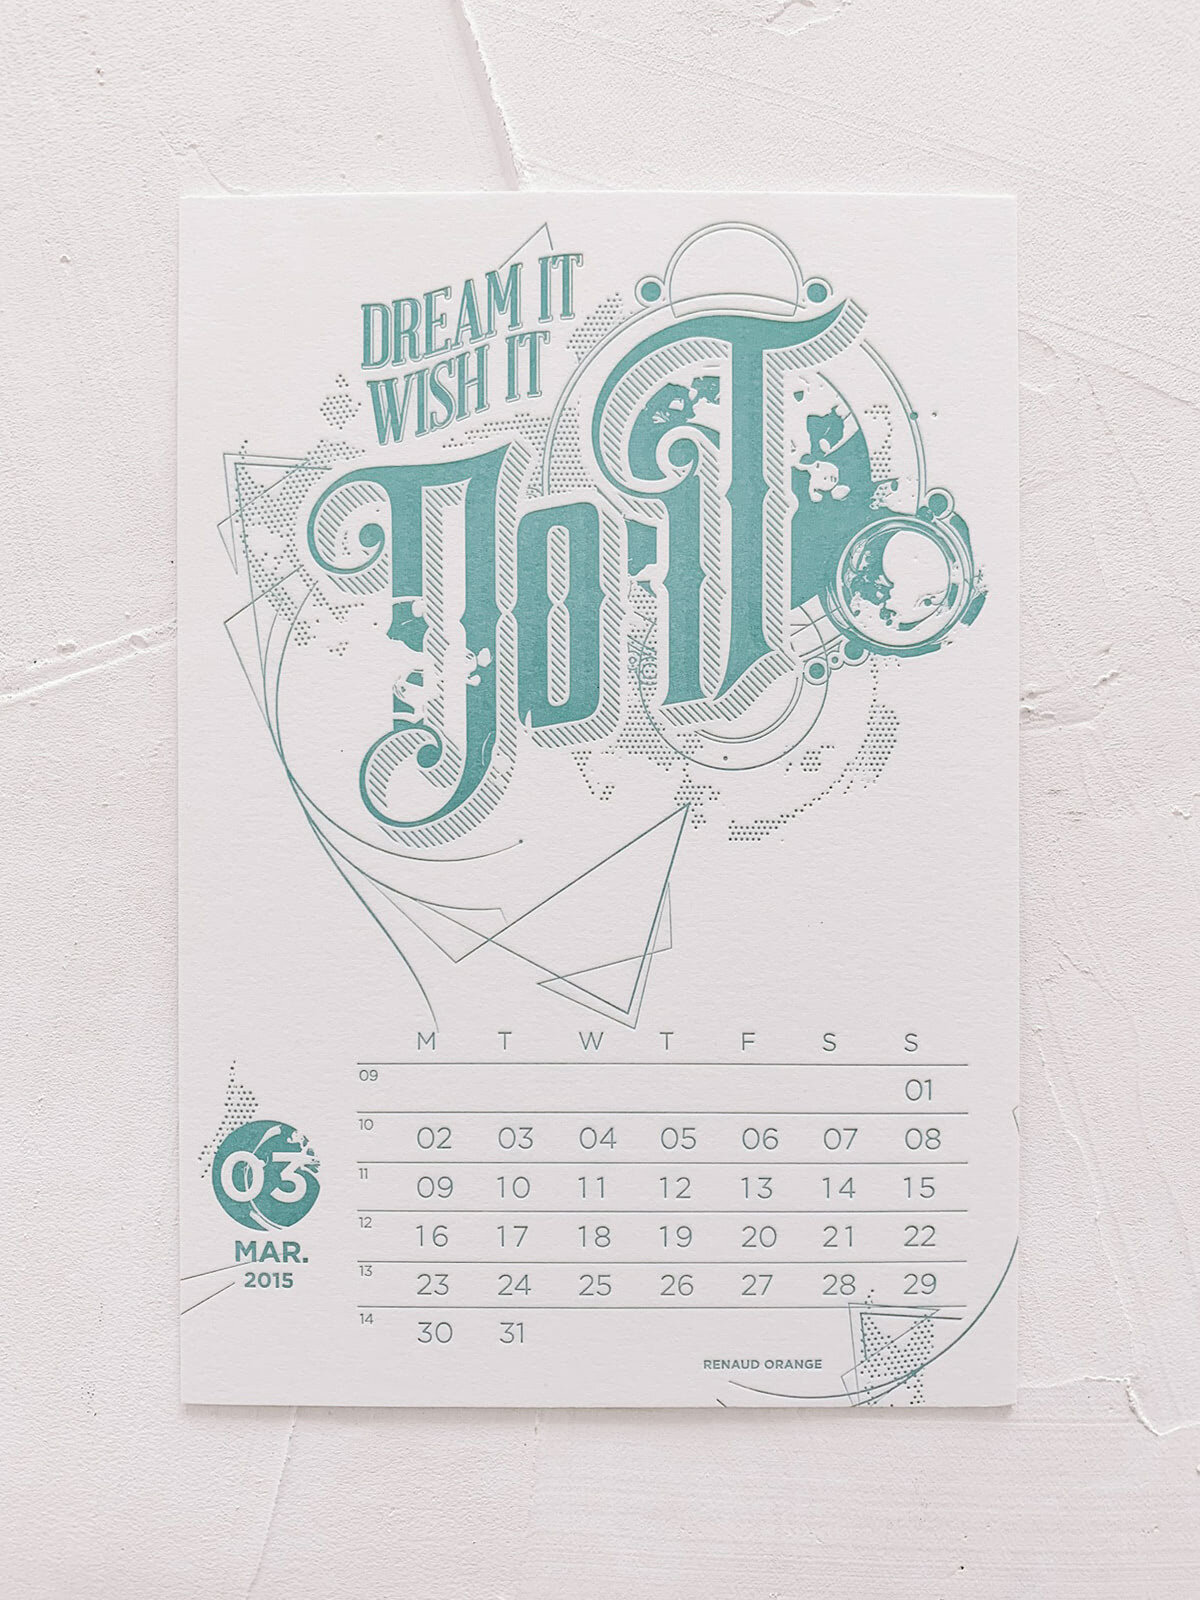 Mr Cup Letterpress Calendar | Design by Renaud Orange | Dream it. Wish it. Do it.